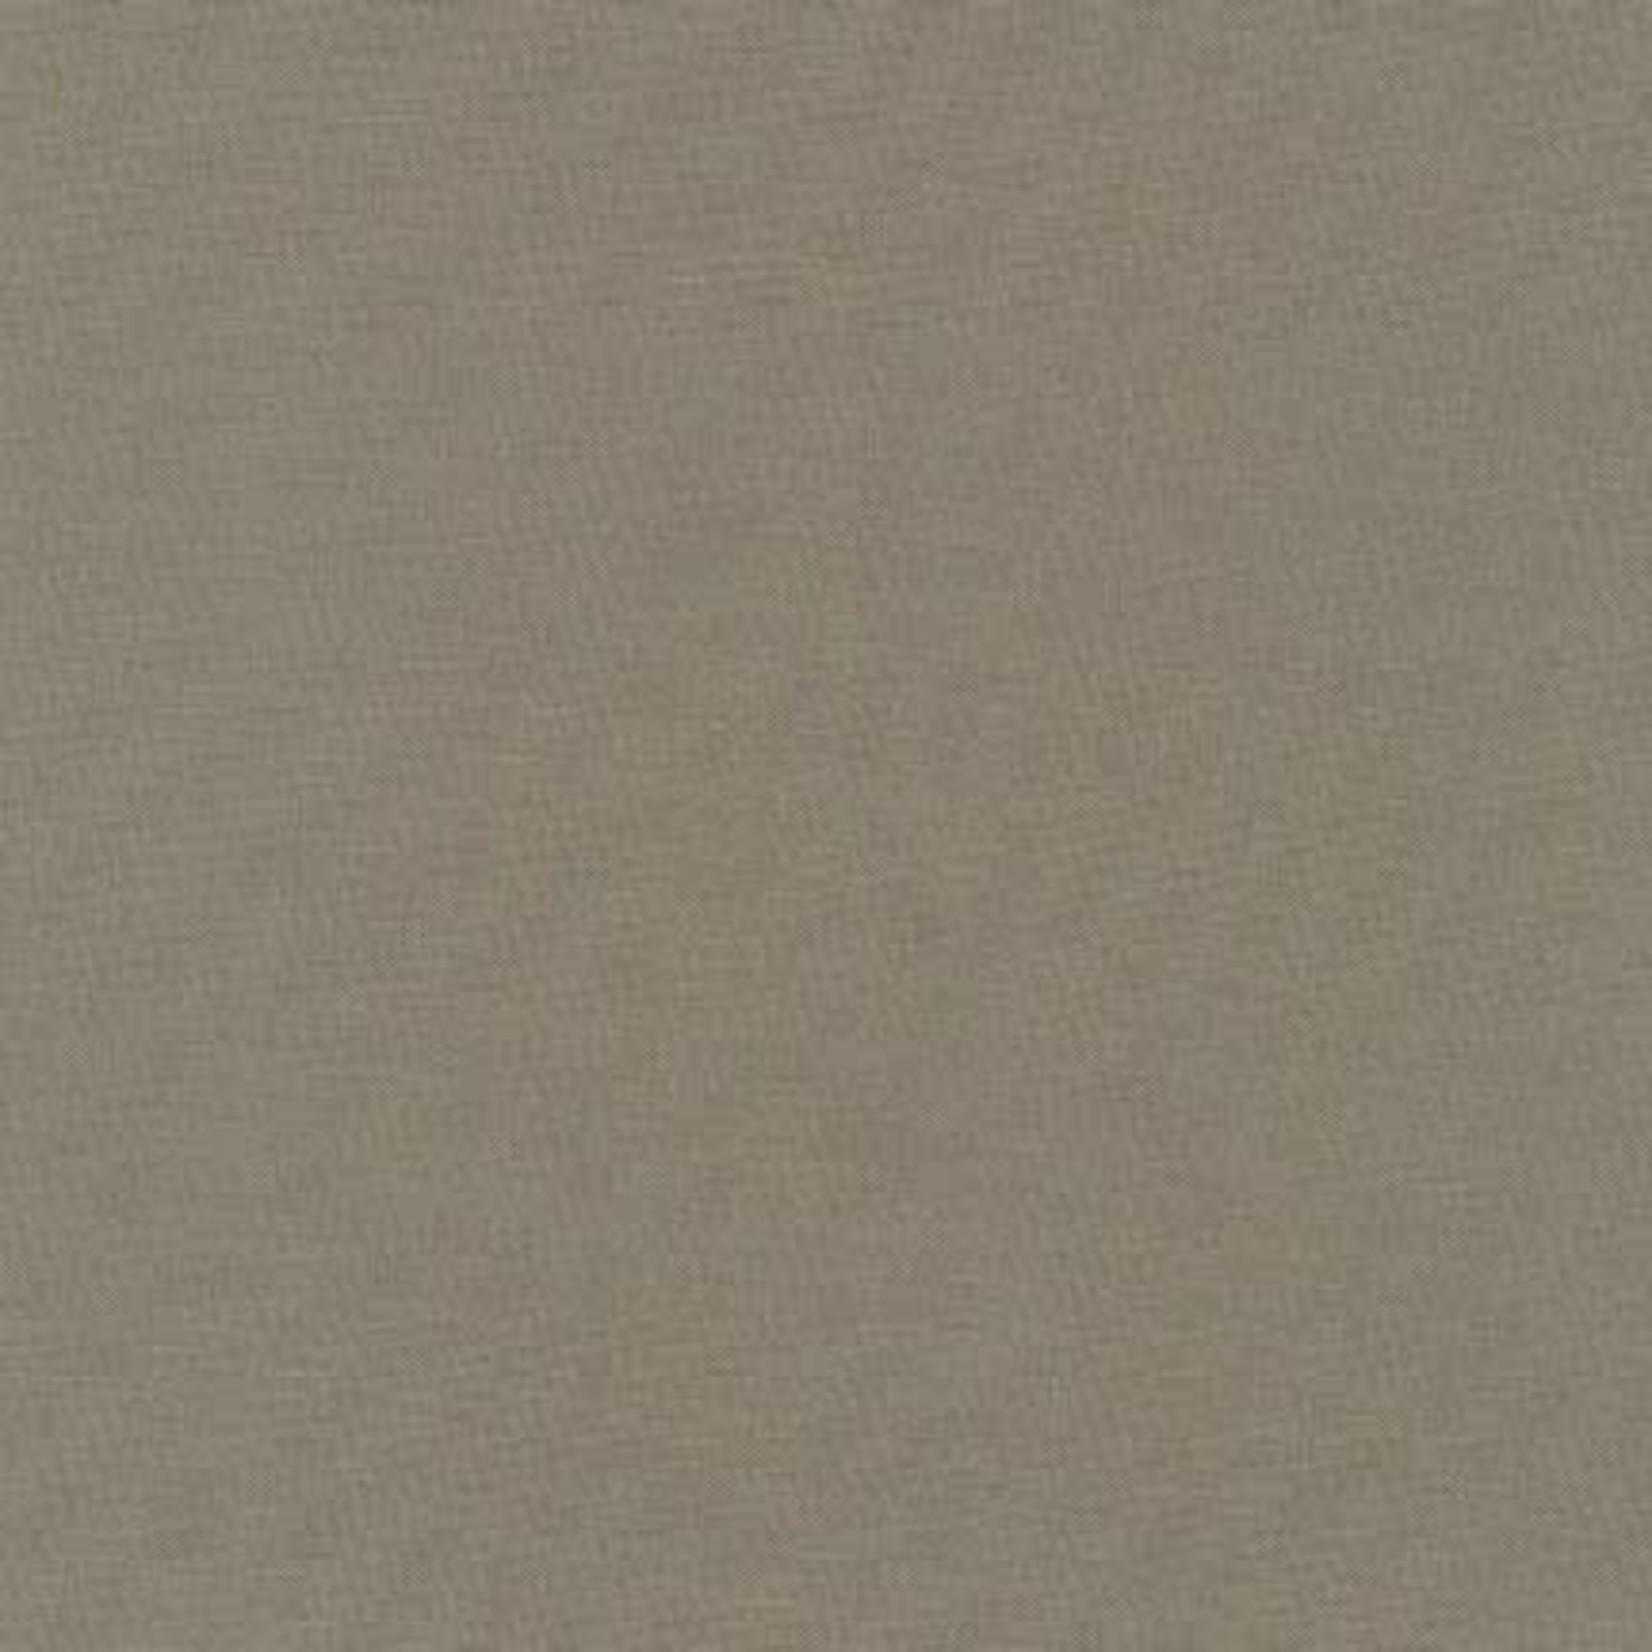 KONA KONA  K001-859 ZINC, PER CM OR $14/M